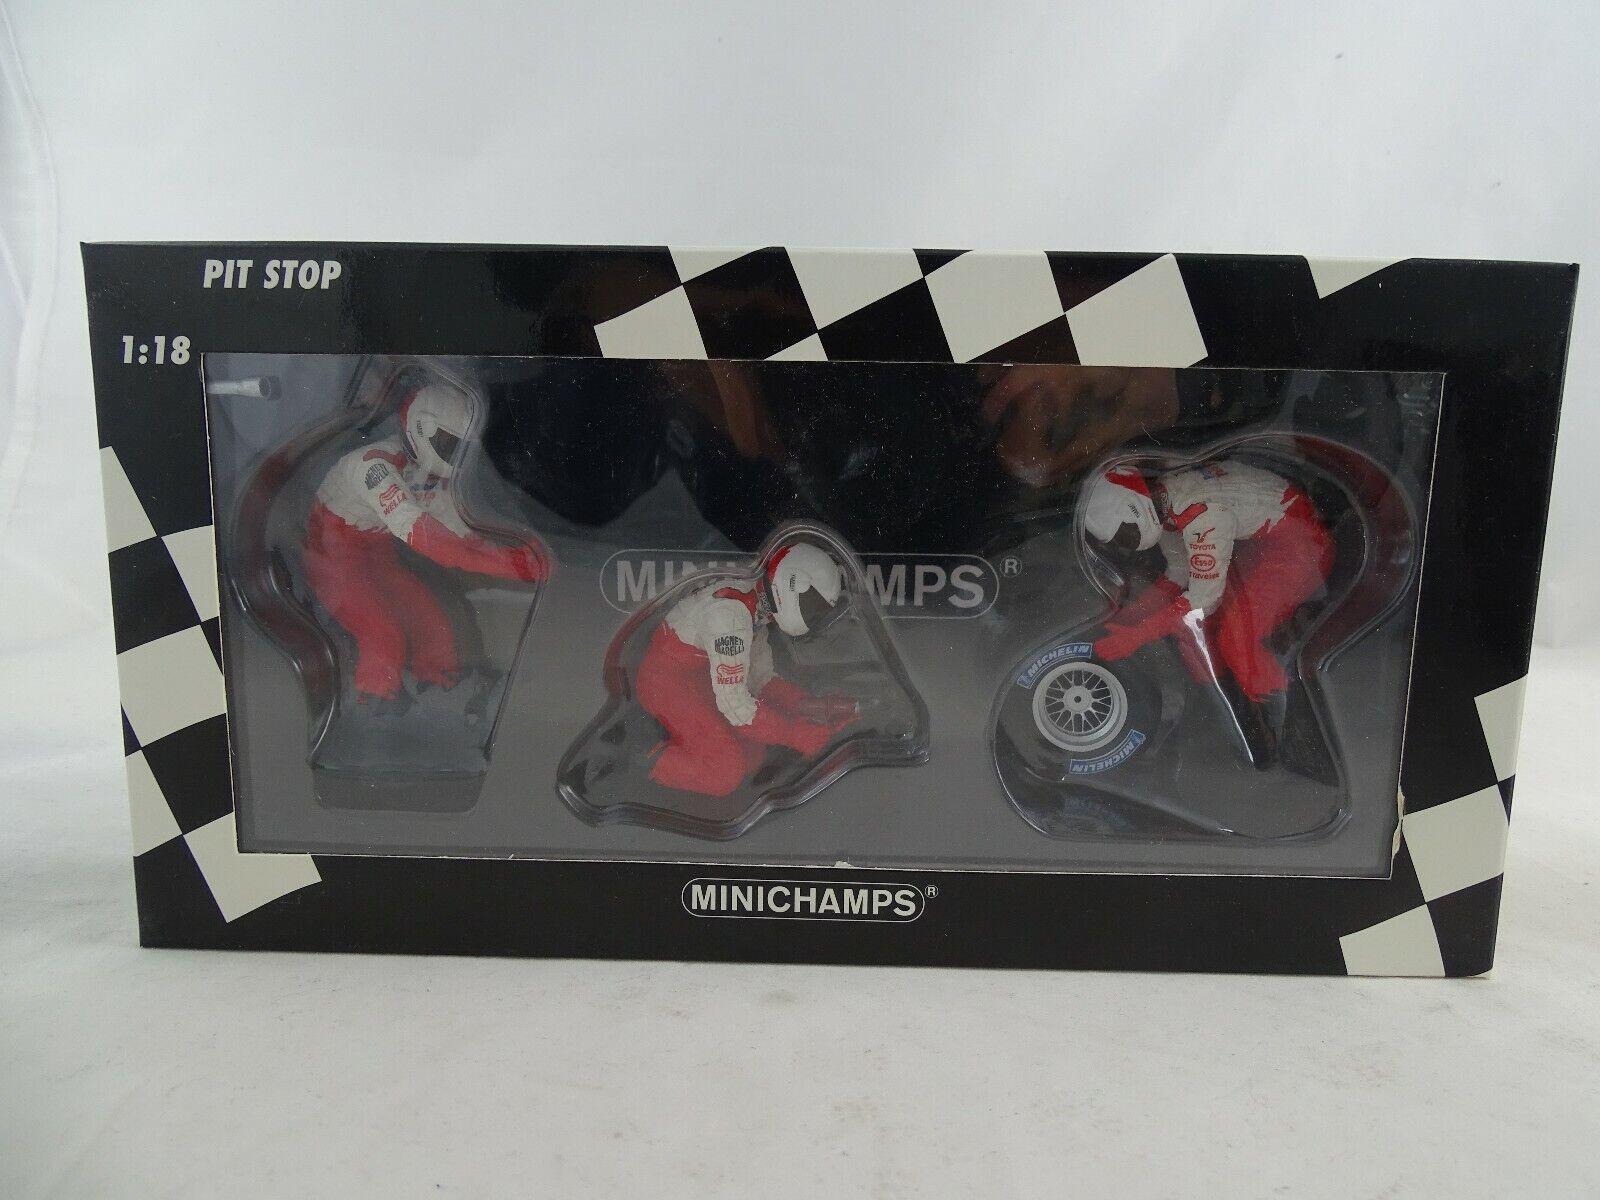 1 18 Minichamps 318100063 Panasonic Toyota Racing Pneus mécanicien personnages set